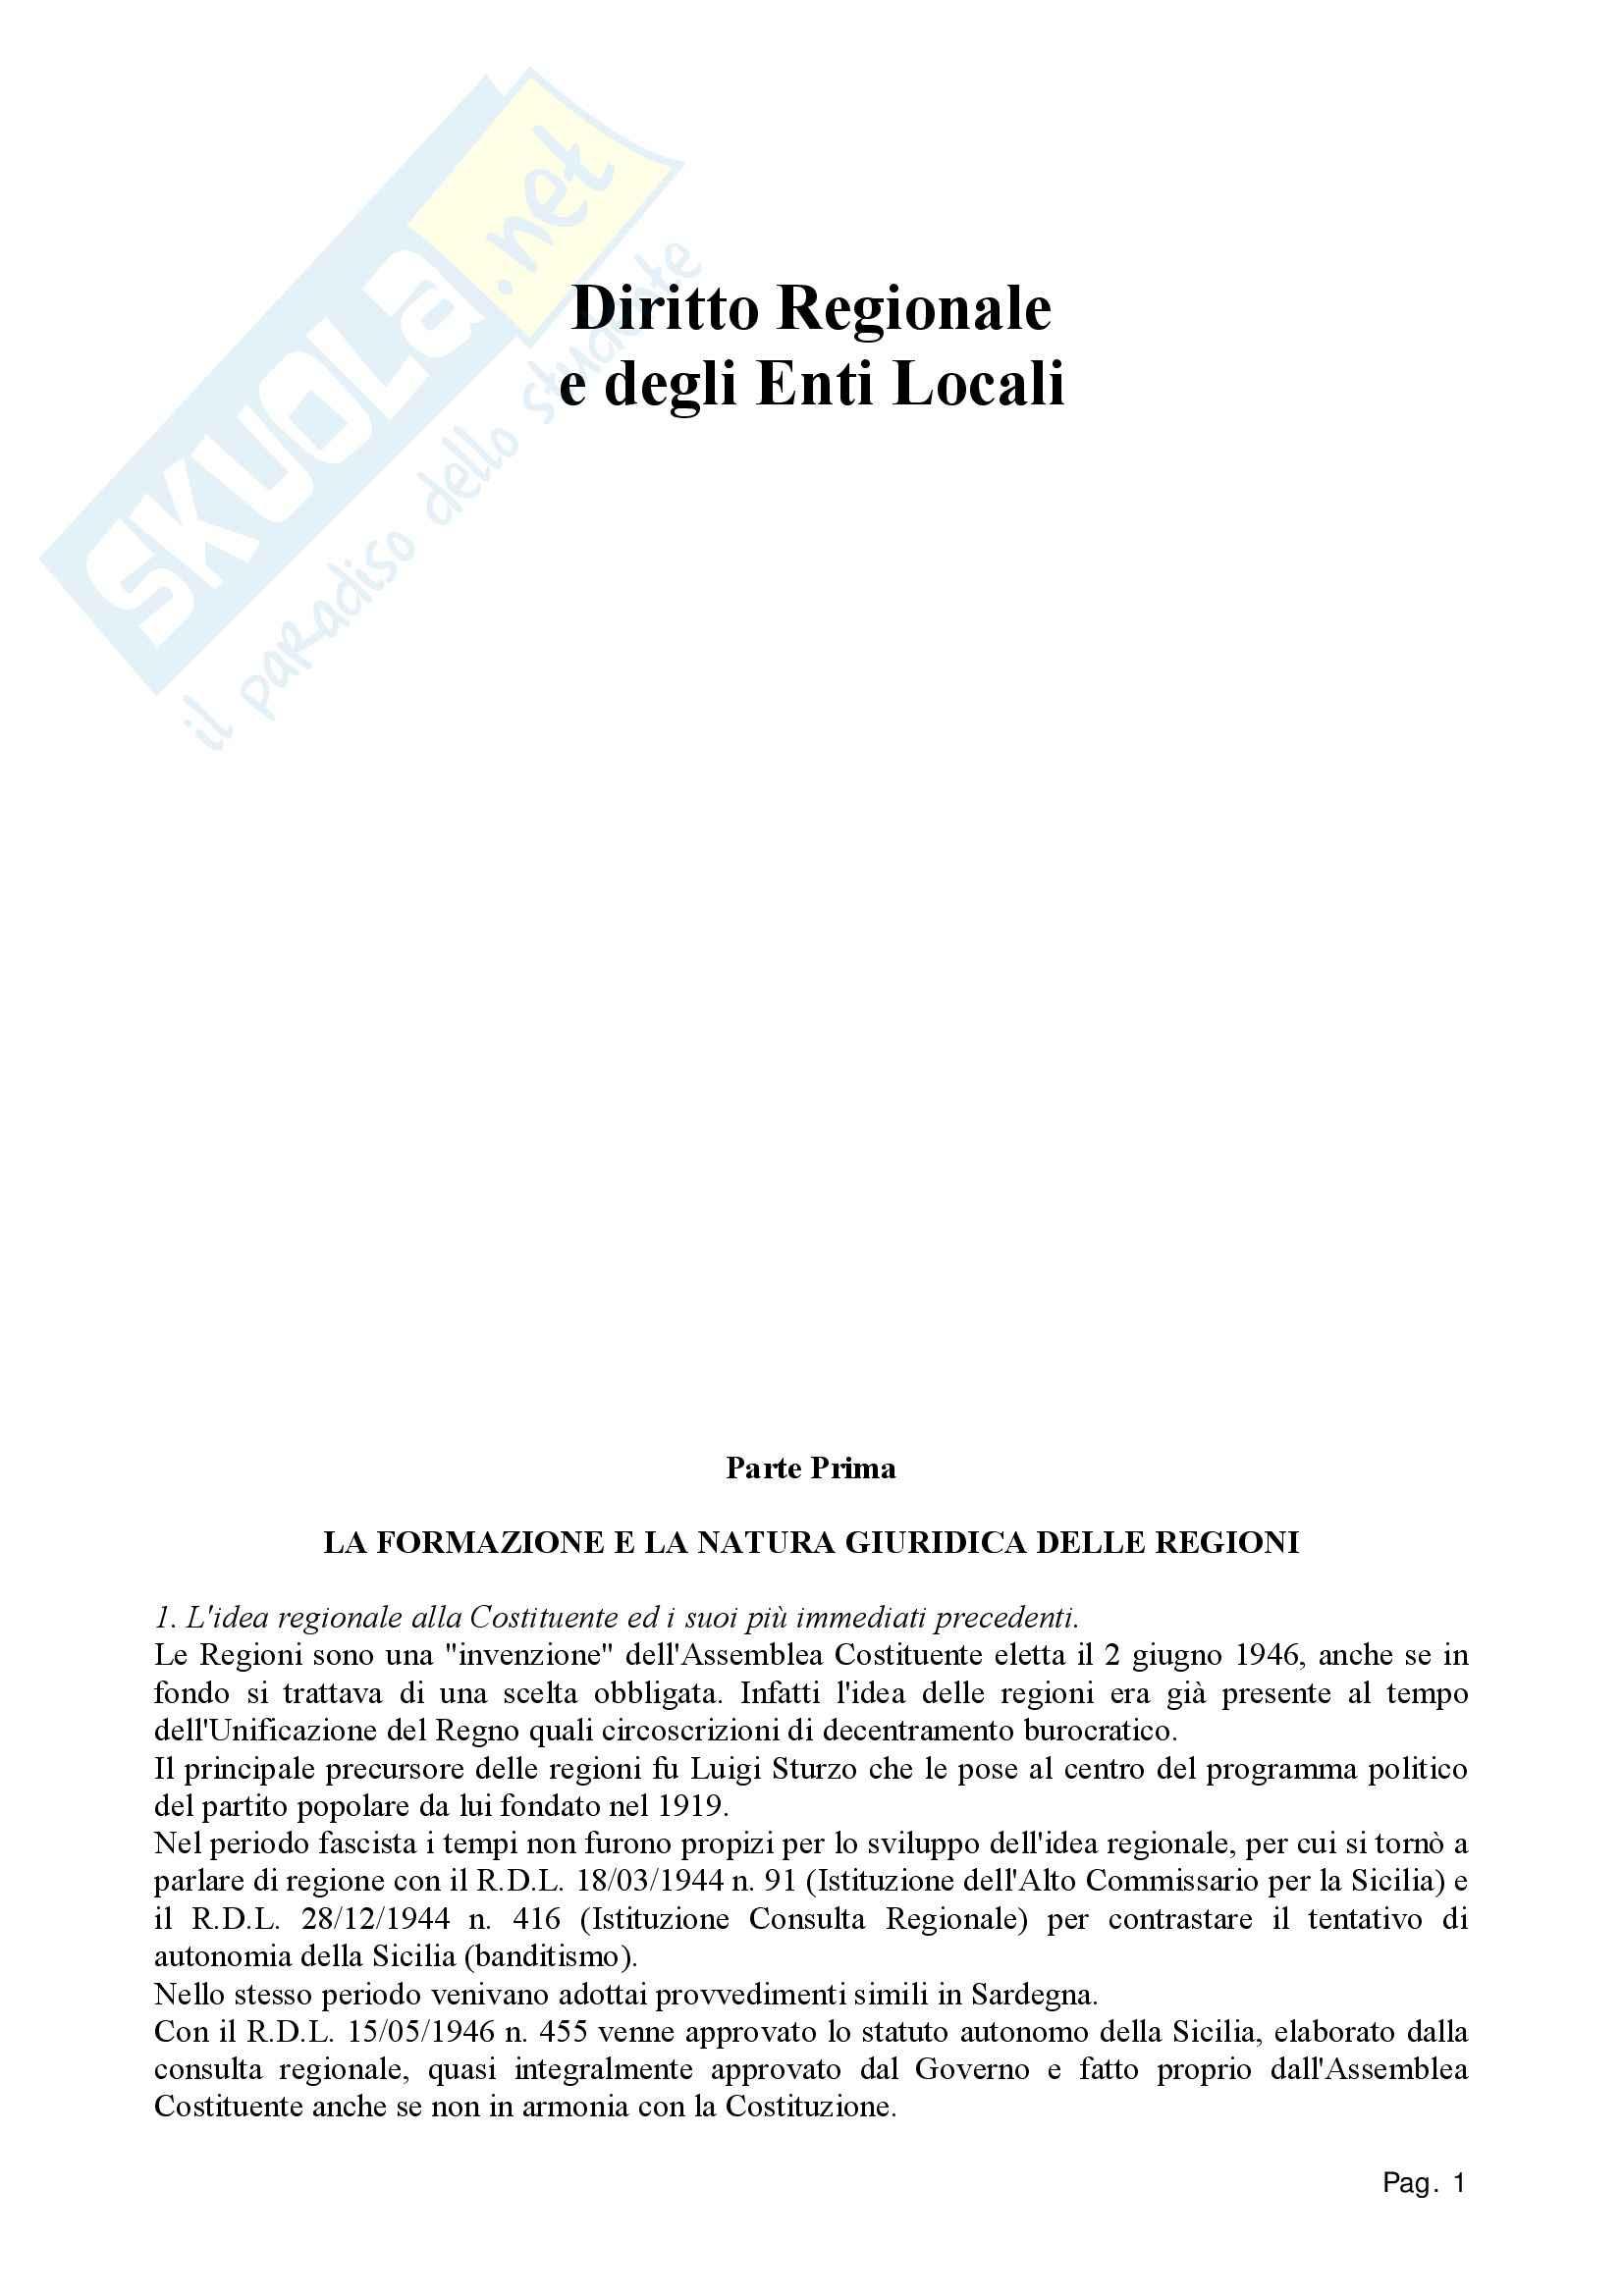 Diritto regionale - Appunti